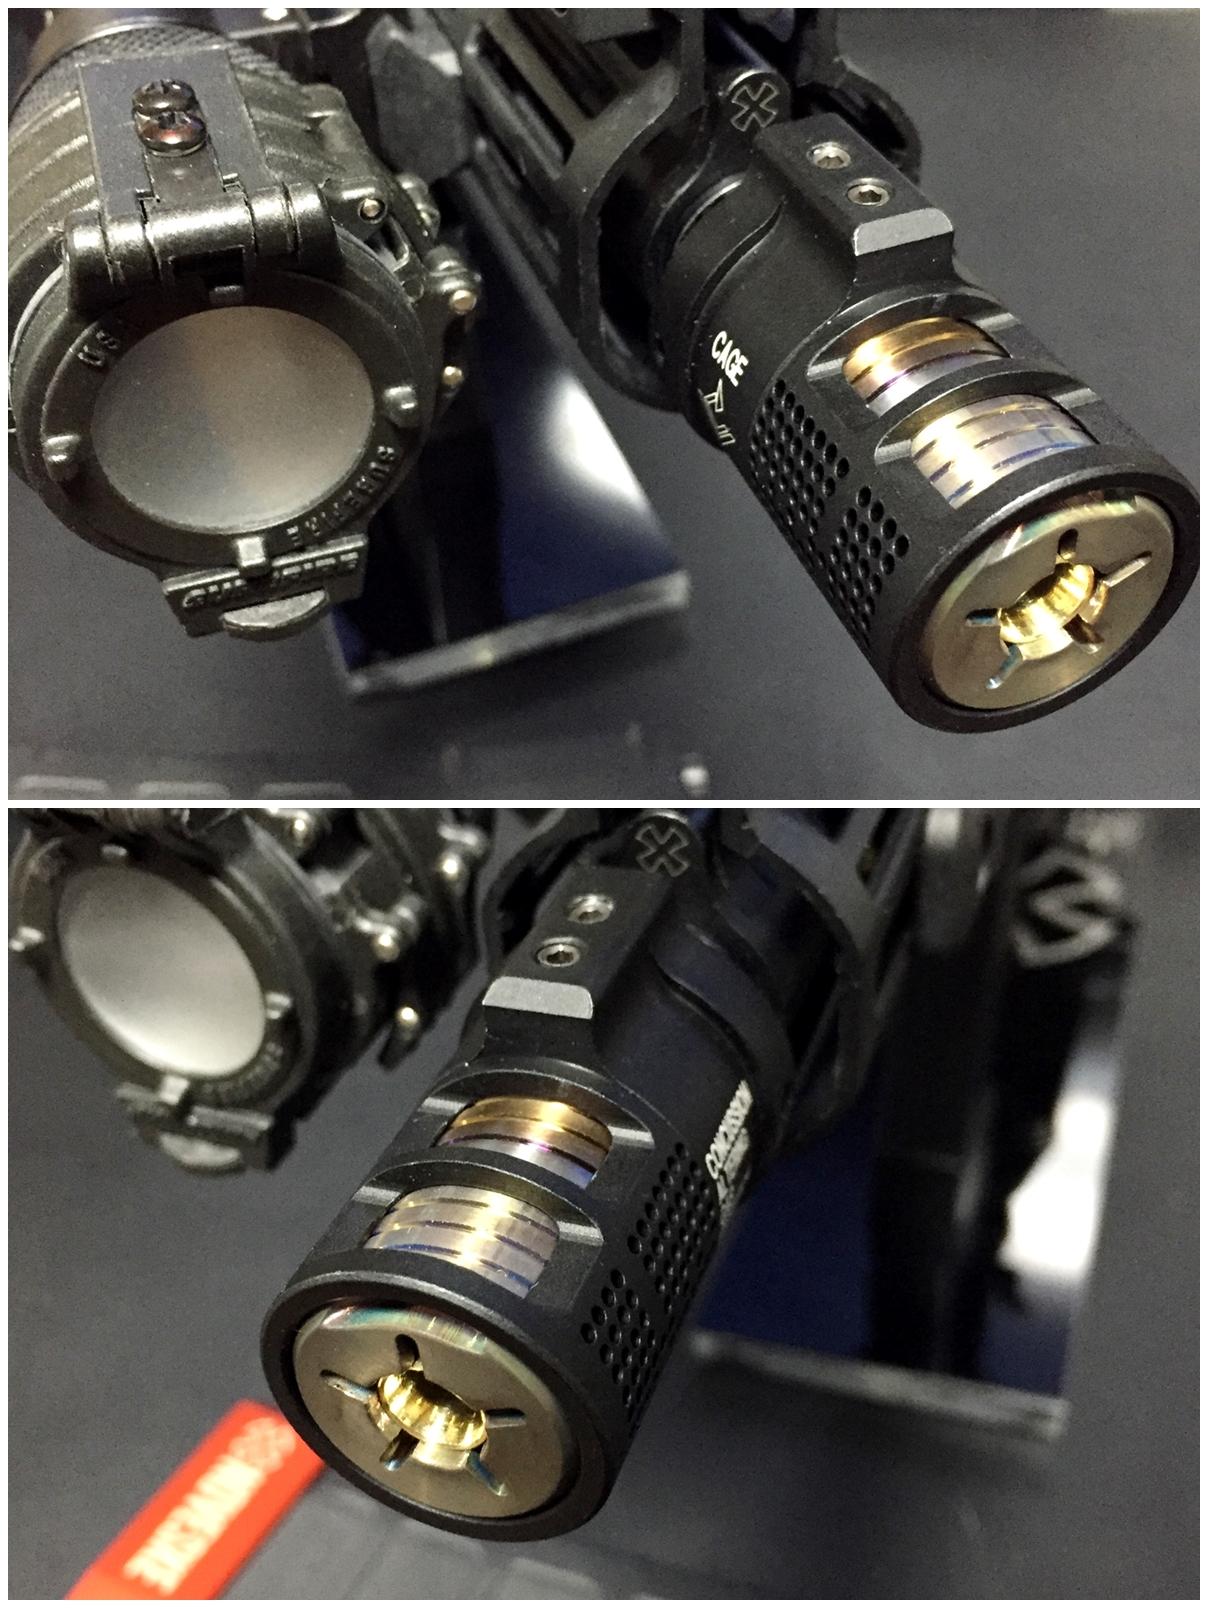 11 VG6 Precision CAGE Device TYPE フラッシュ ハイダー ブラストシールド オプション カバー 購入 開封 比較 実物 レプリカ レビュー